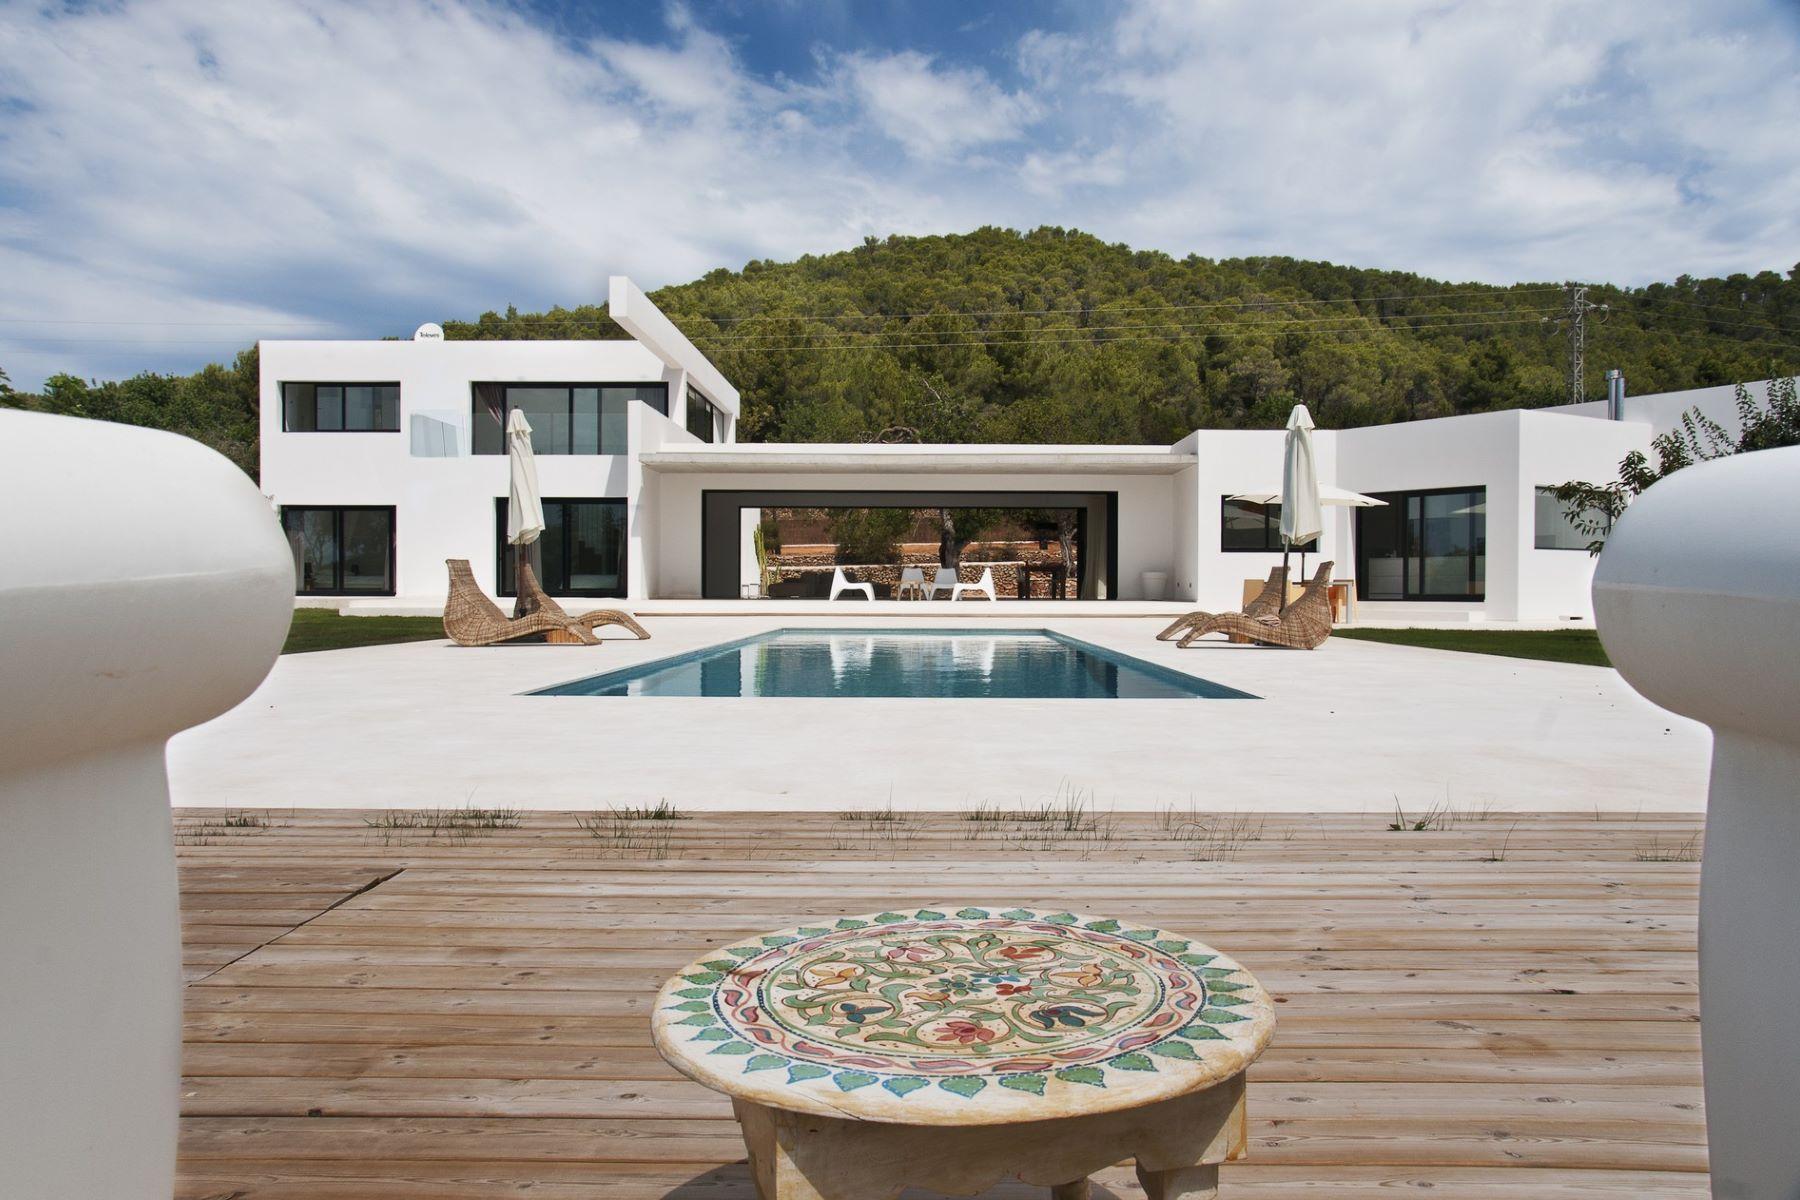 Casa Unifamiliar por un Alquiler en Contemporary New Villa In San Juan Other Balearic Islands, Balearic Islands, España